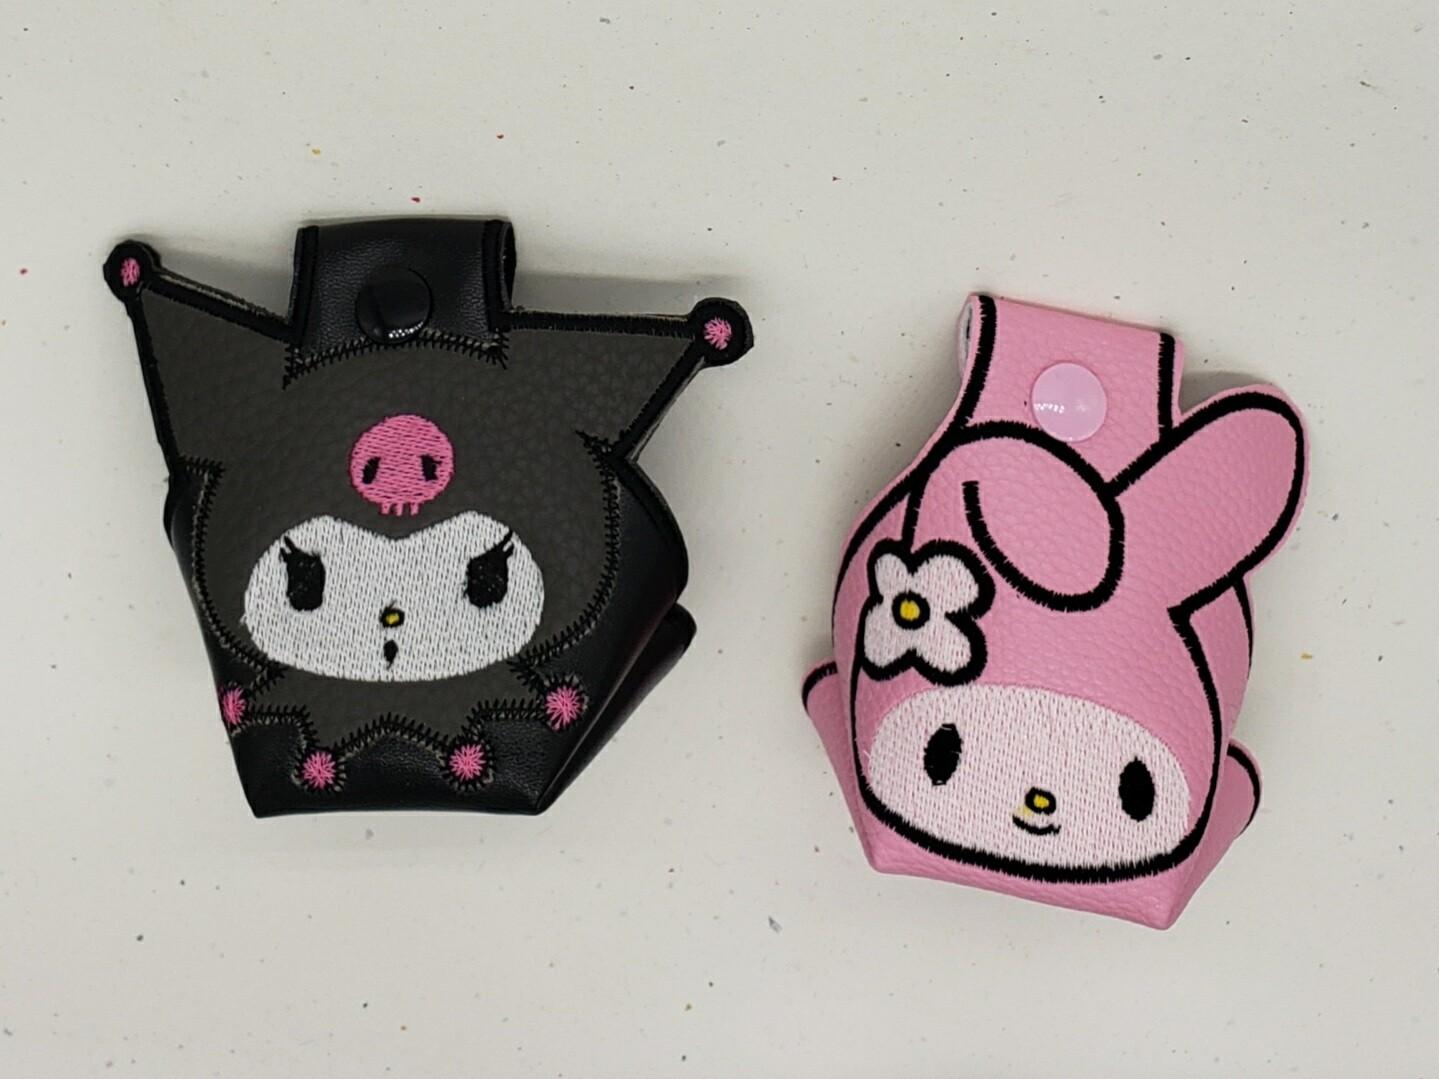 My Melody, Kuromi  or Badtz Maru toe guards - one pair